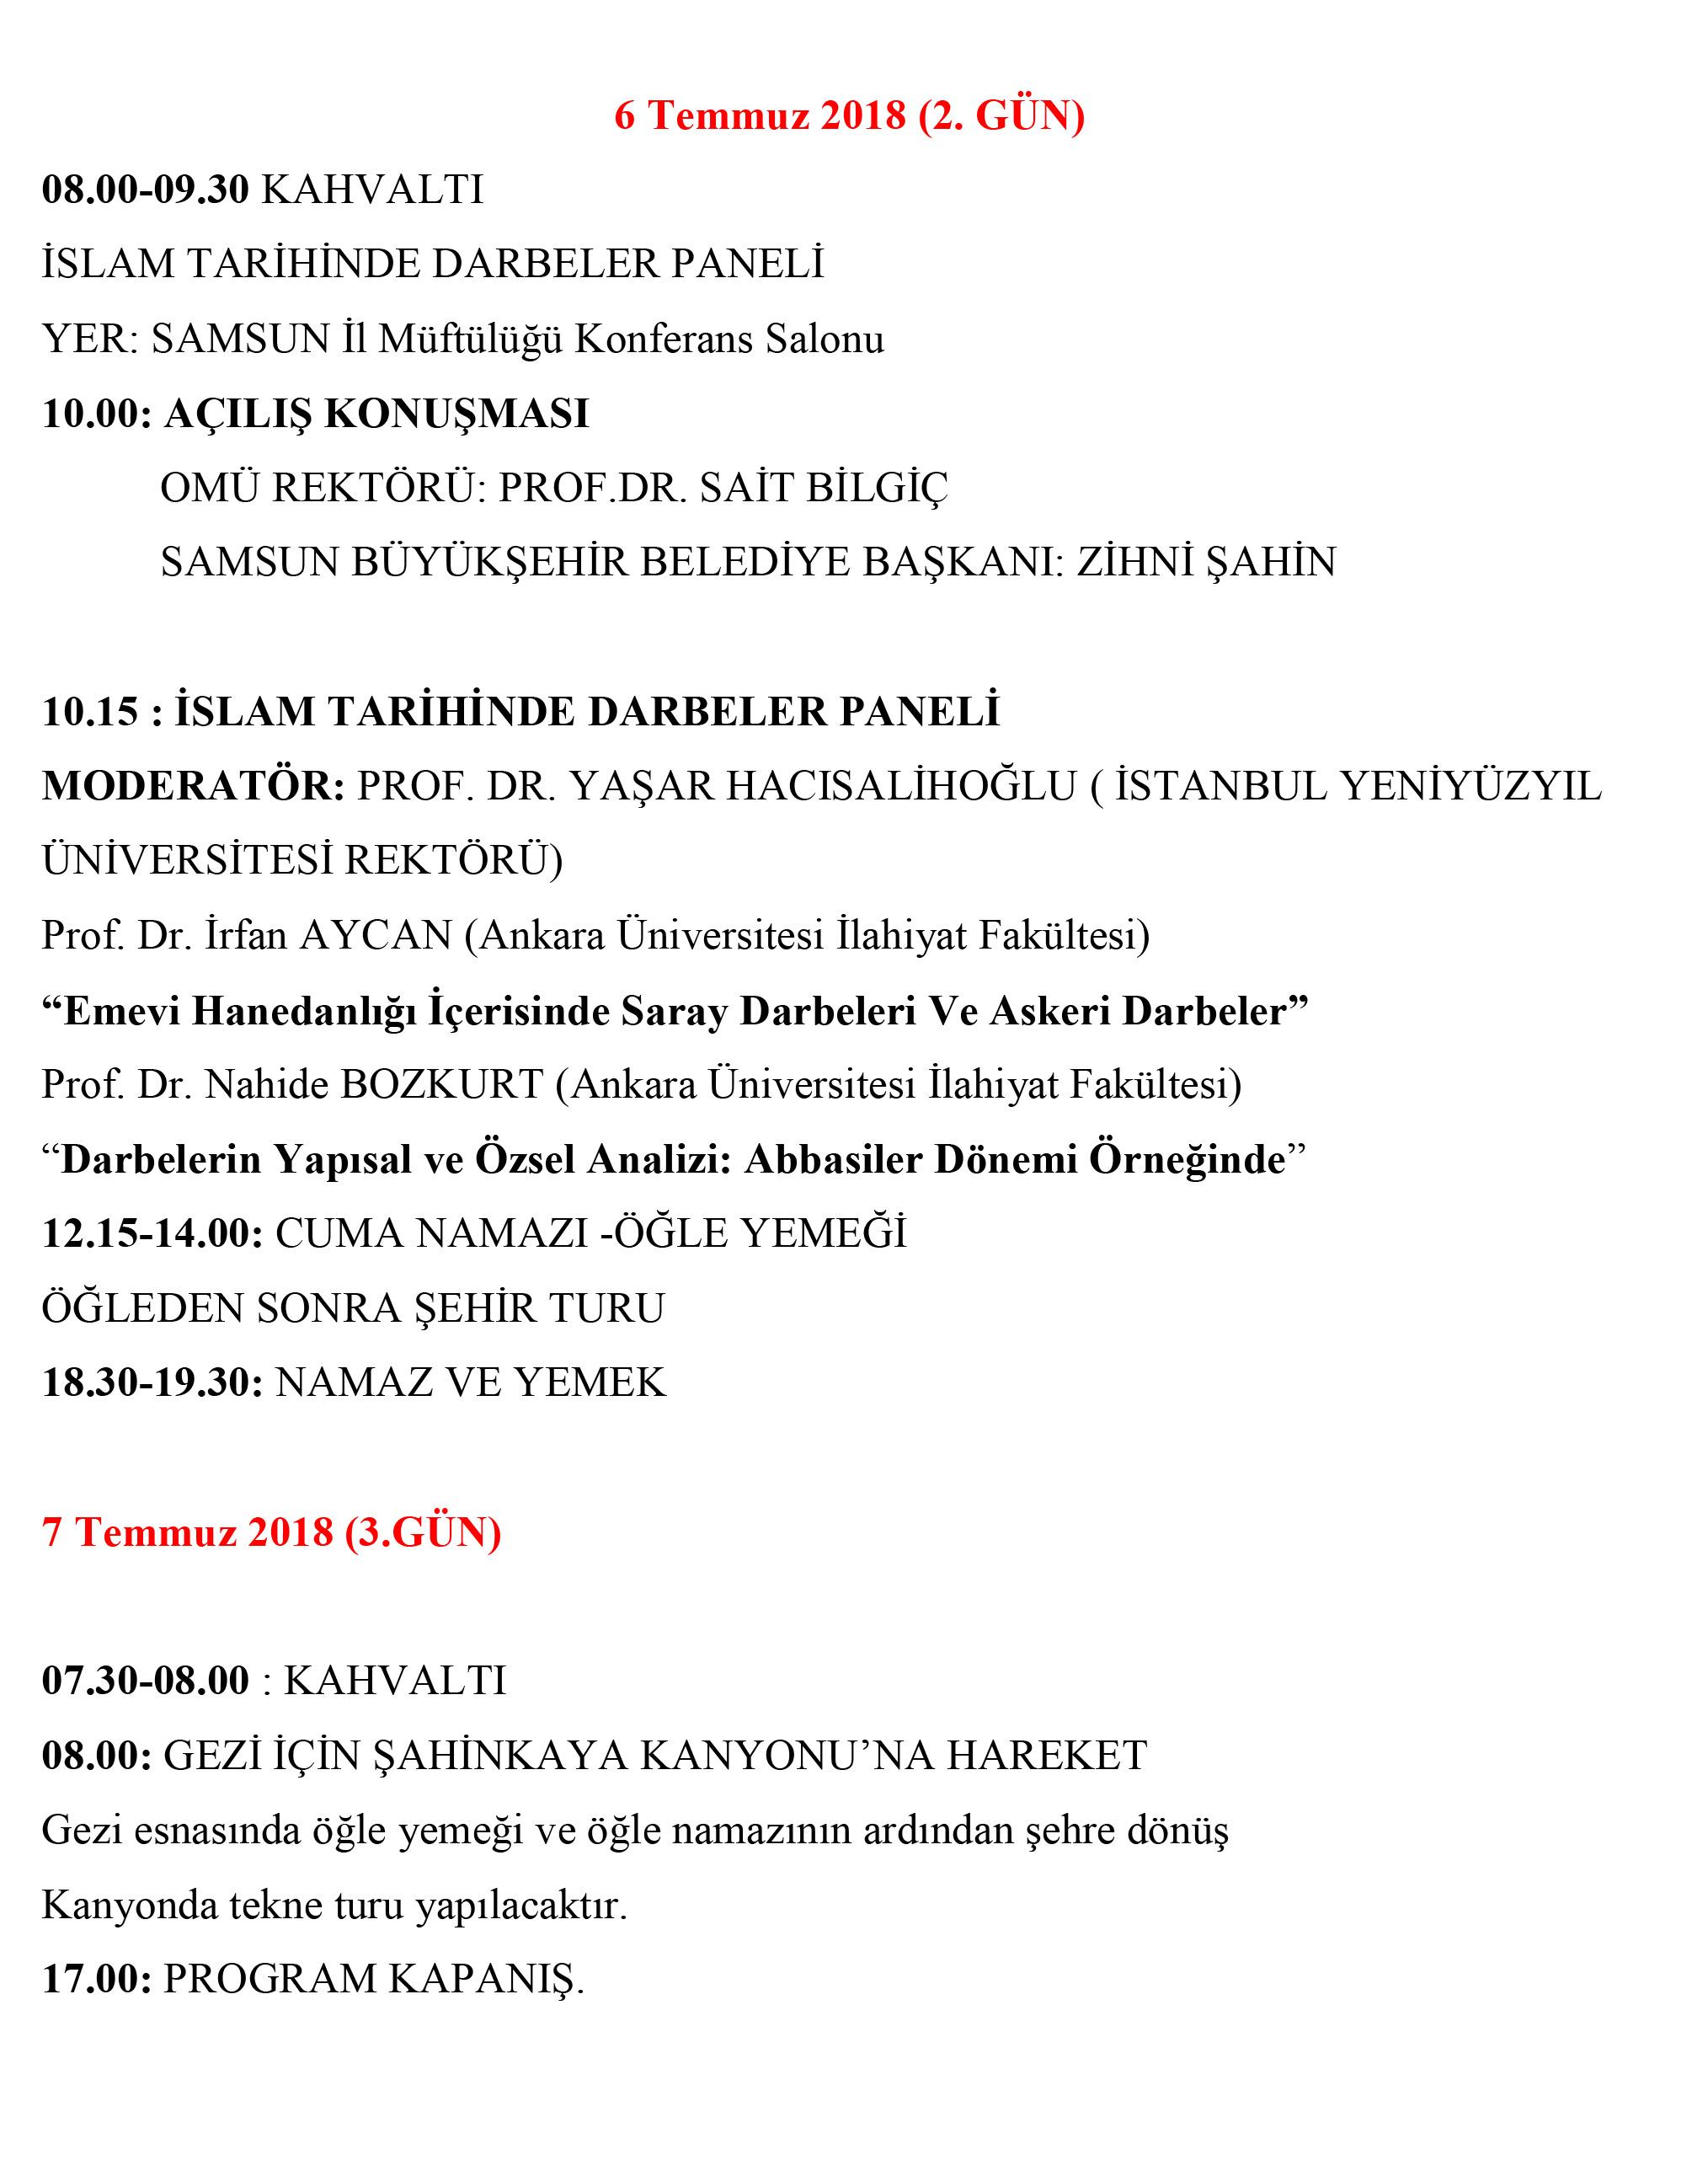 http://www.omu.edu.tr/sites/default/files/omu_islam_tarihinde_darbeler_kongre_program_akisi-2.jpg